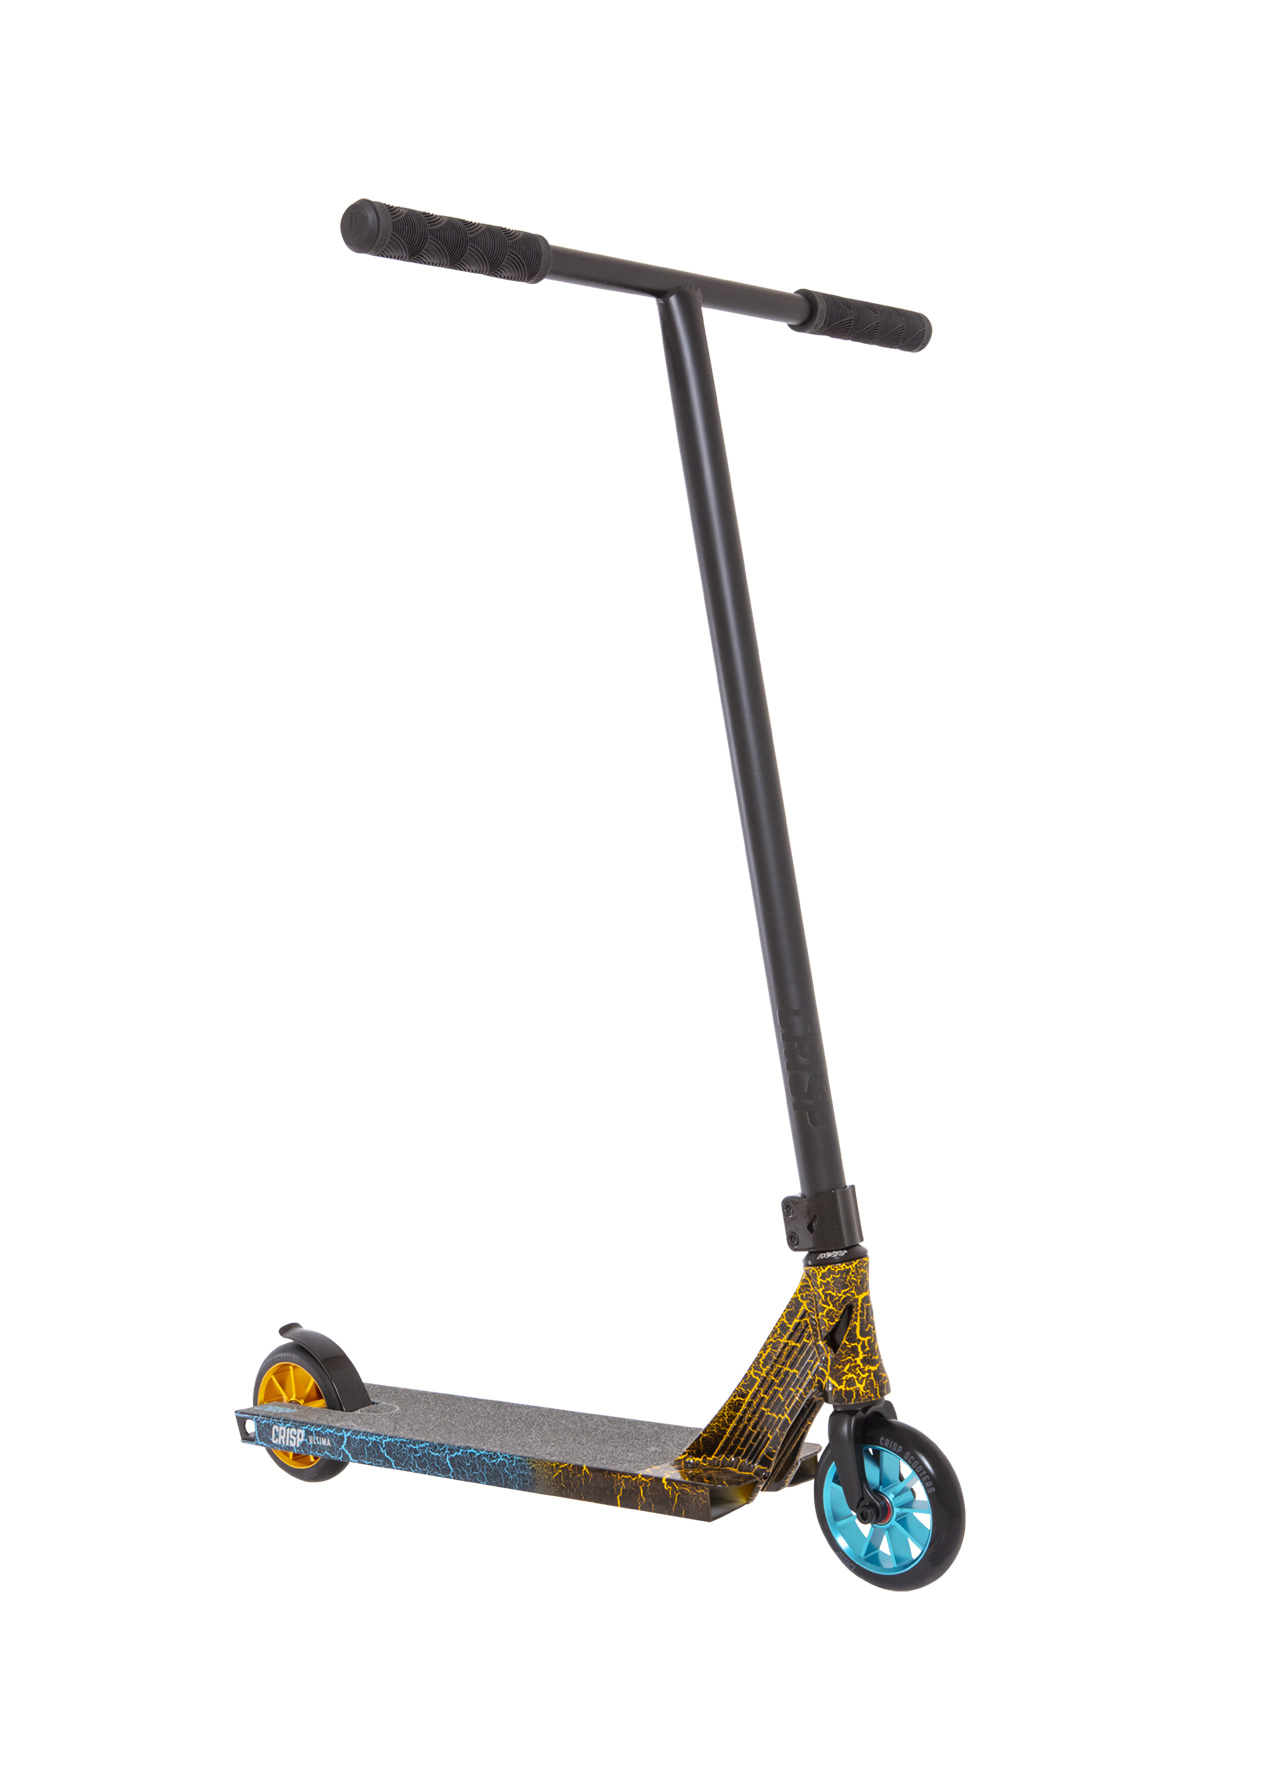 Crisp Scooters 5.0T